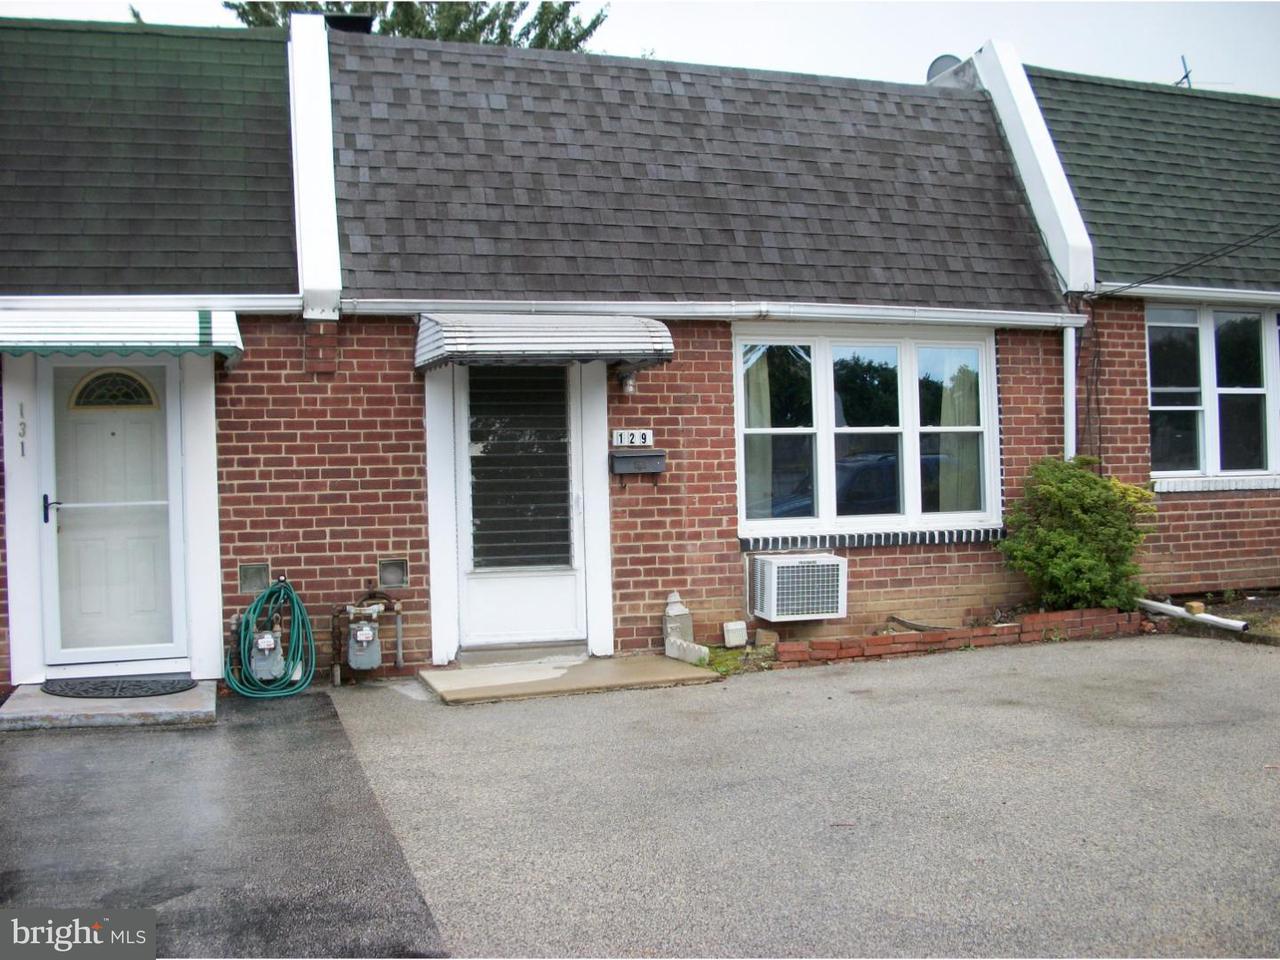 Townhouse for Sale at 129 E LAUGHEAD Avenue Linwood, Pennsylvania 19061 United States